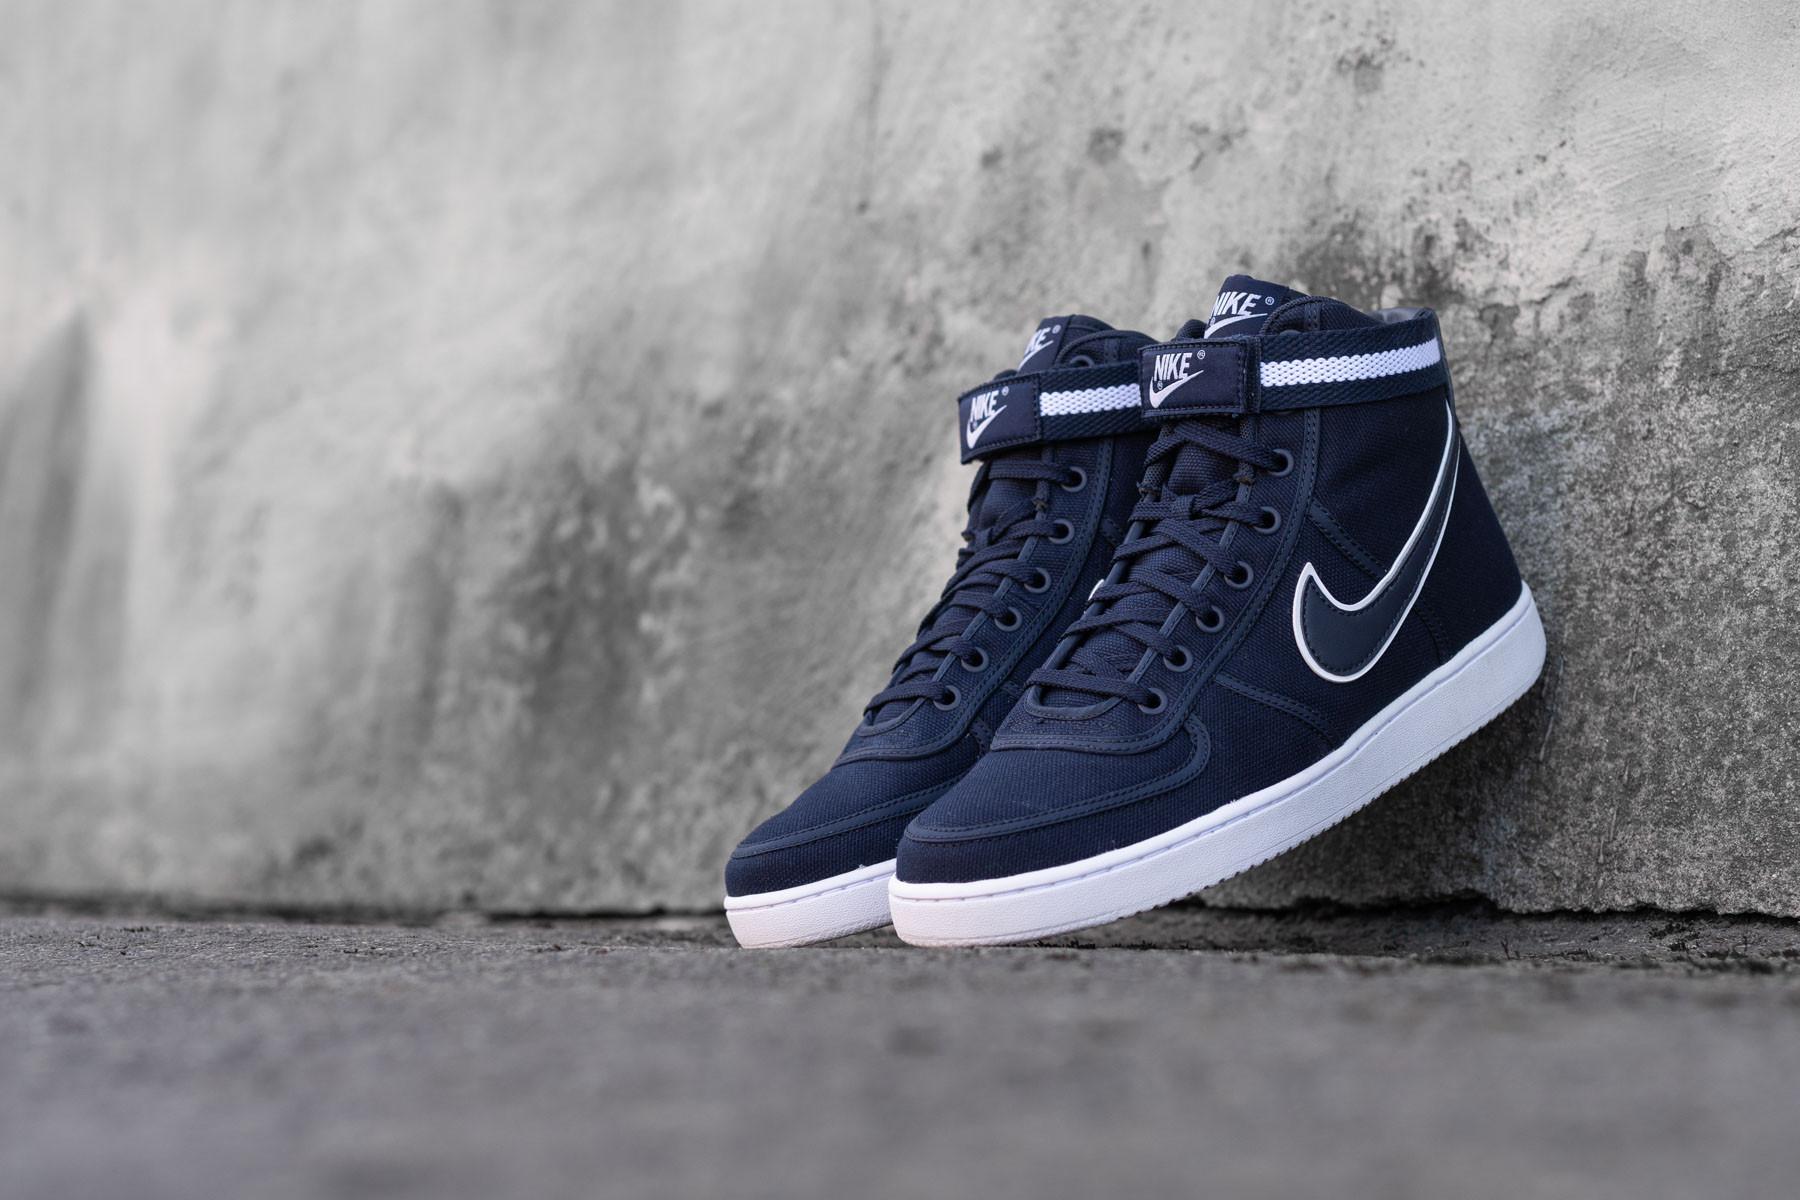 hot sale online 58447 233ff Nike Vandal High Supreme - Sneaker.no